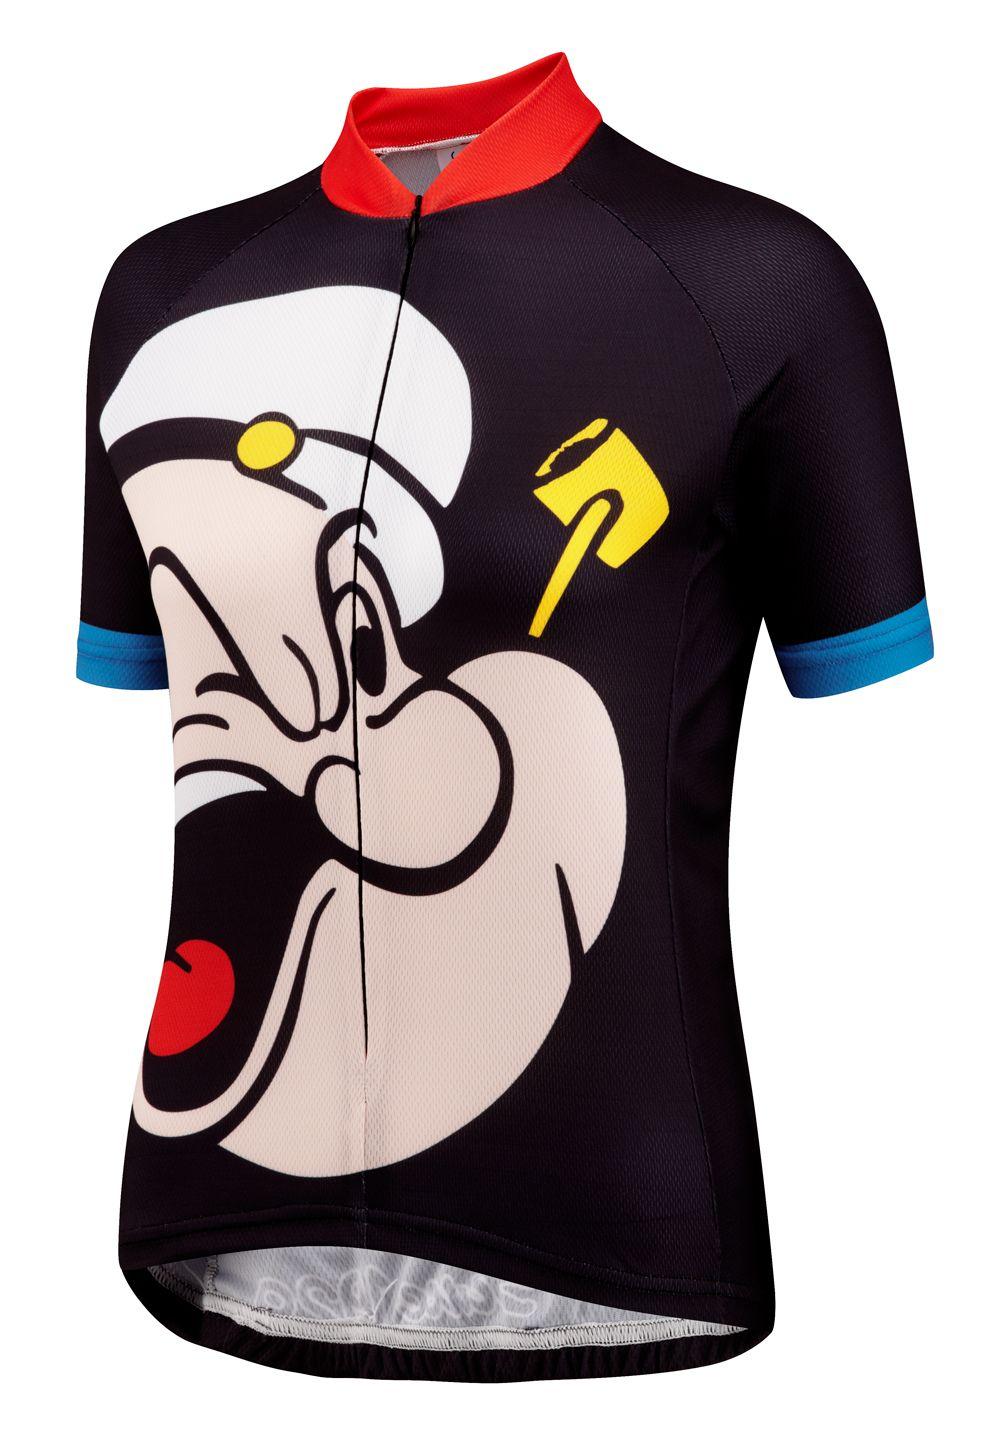 Popeye Road Cycling Jersey | Foska.com